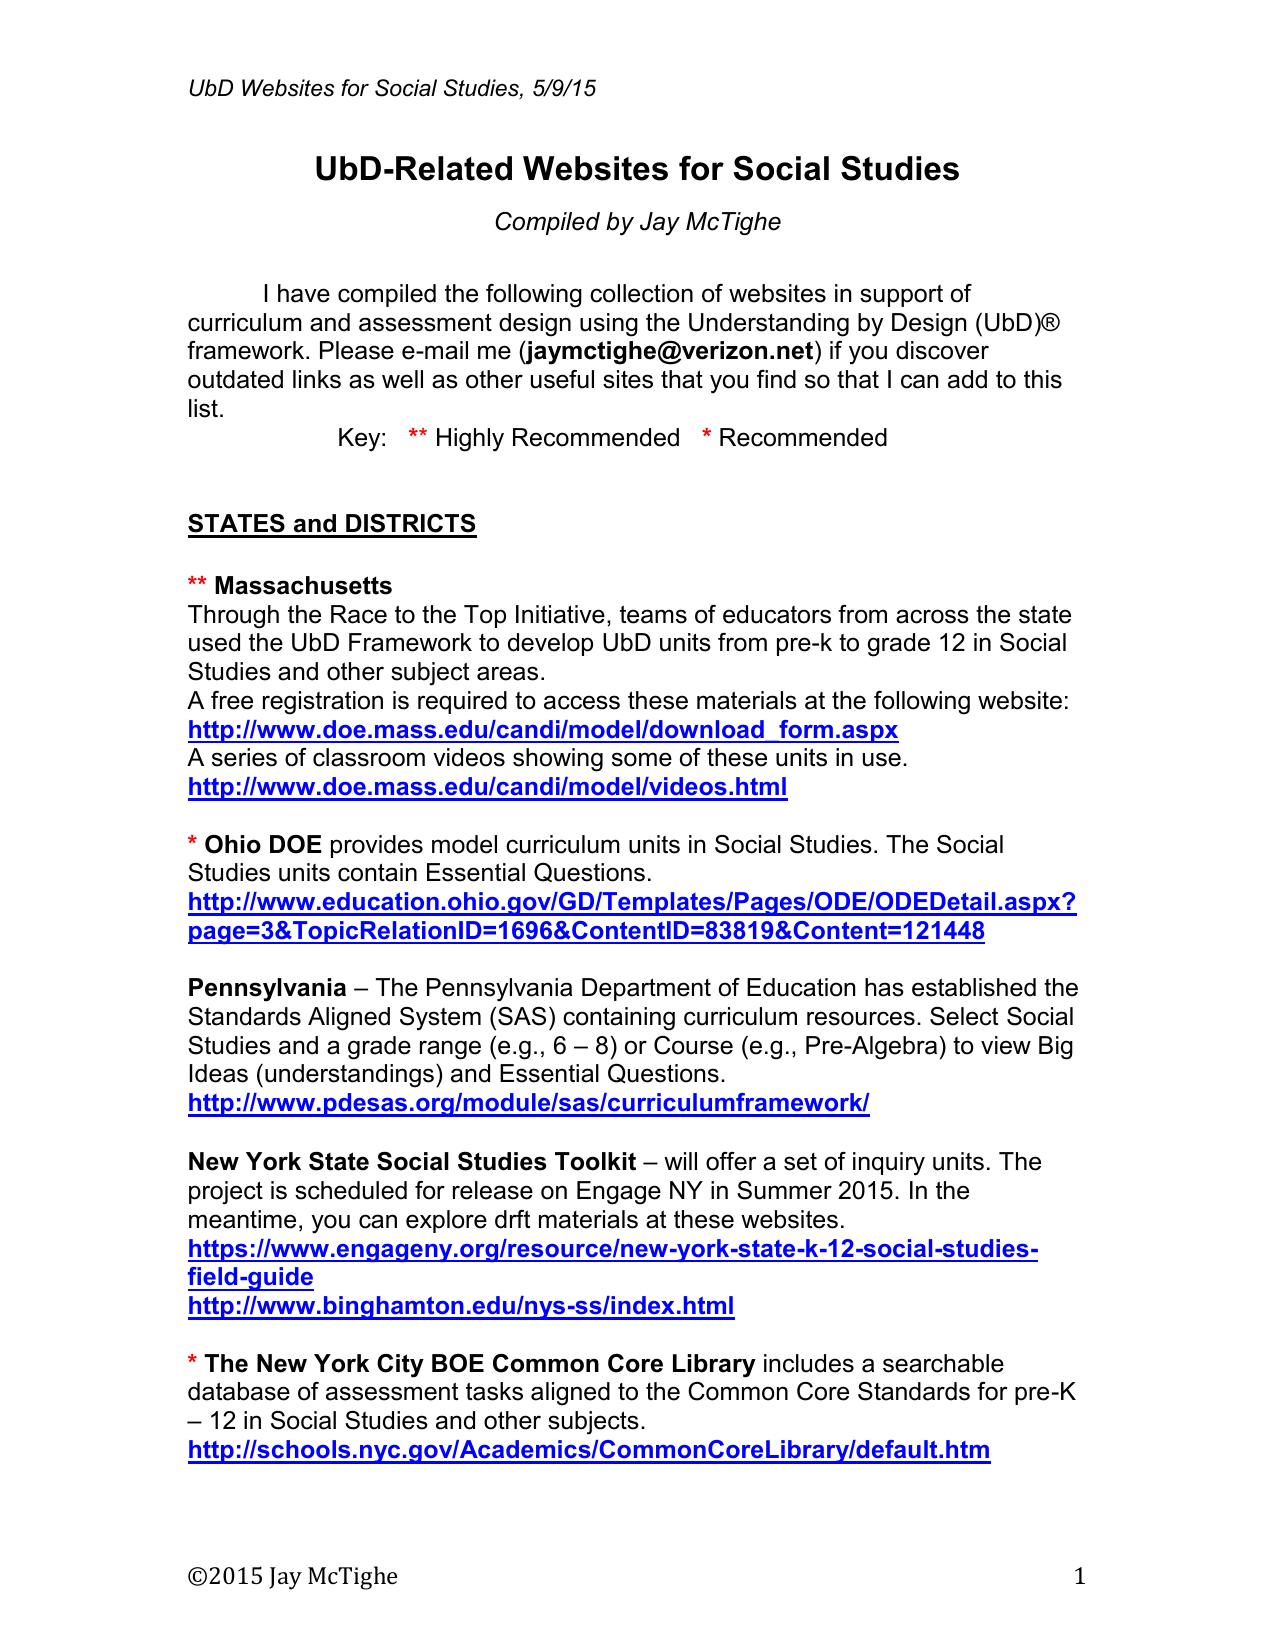 Social Studies UbD Websites